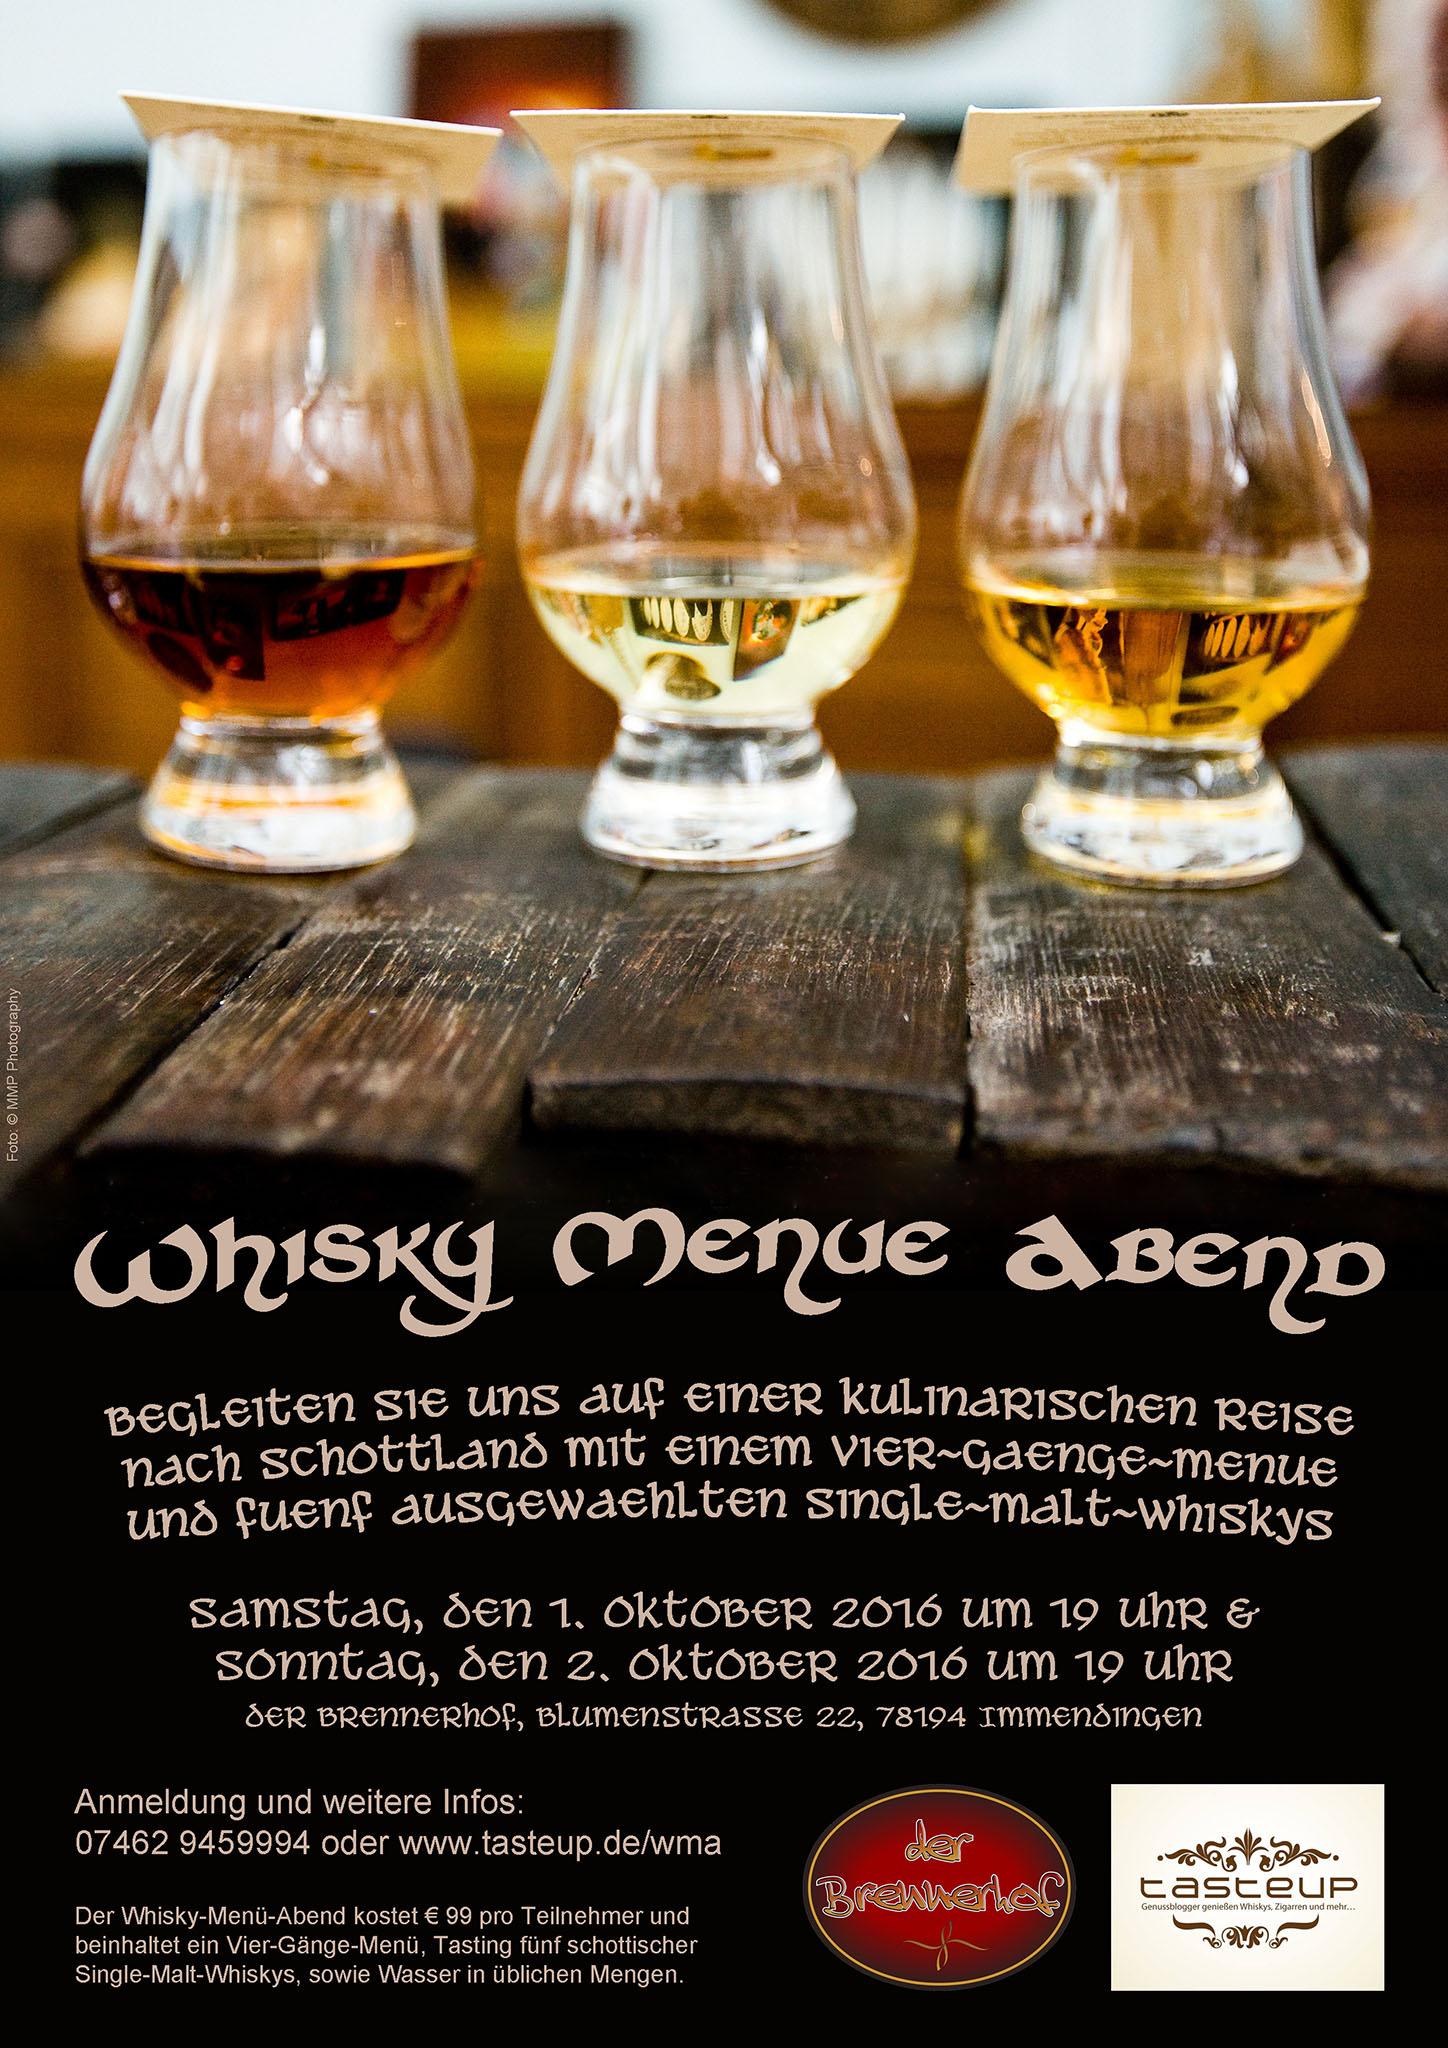 5. Tasteup Whiskymenüabend